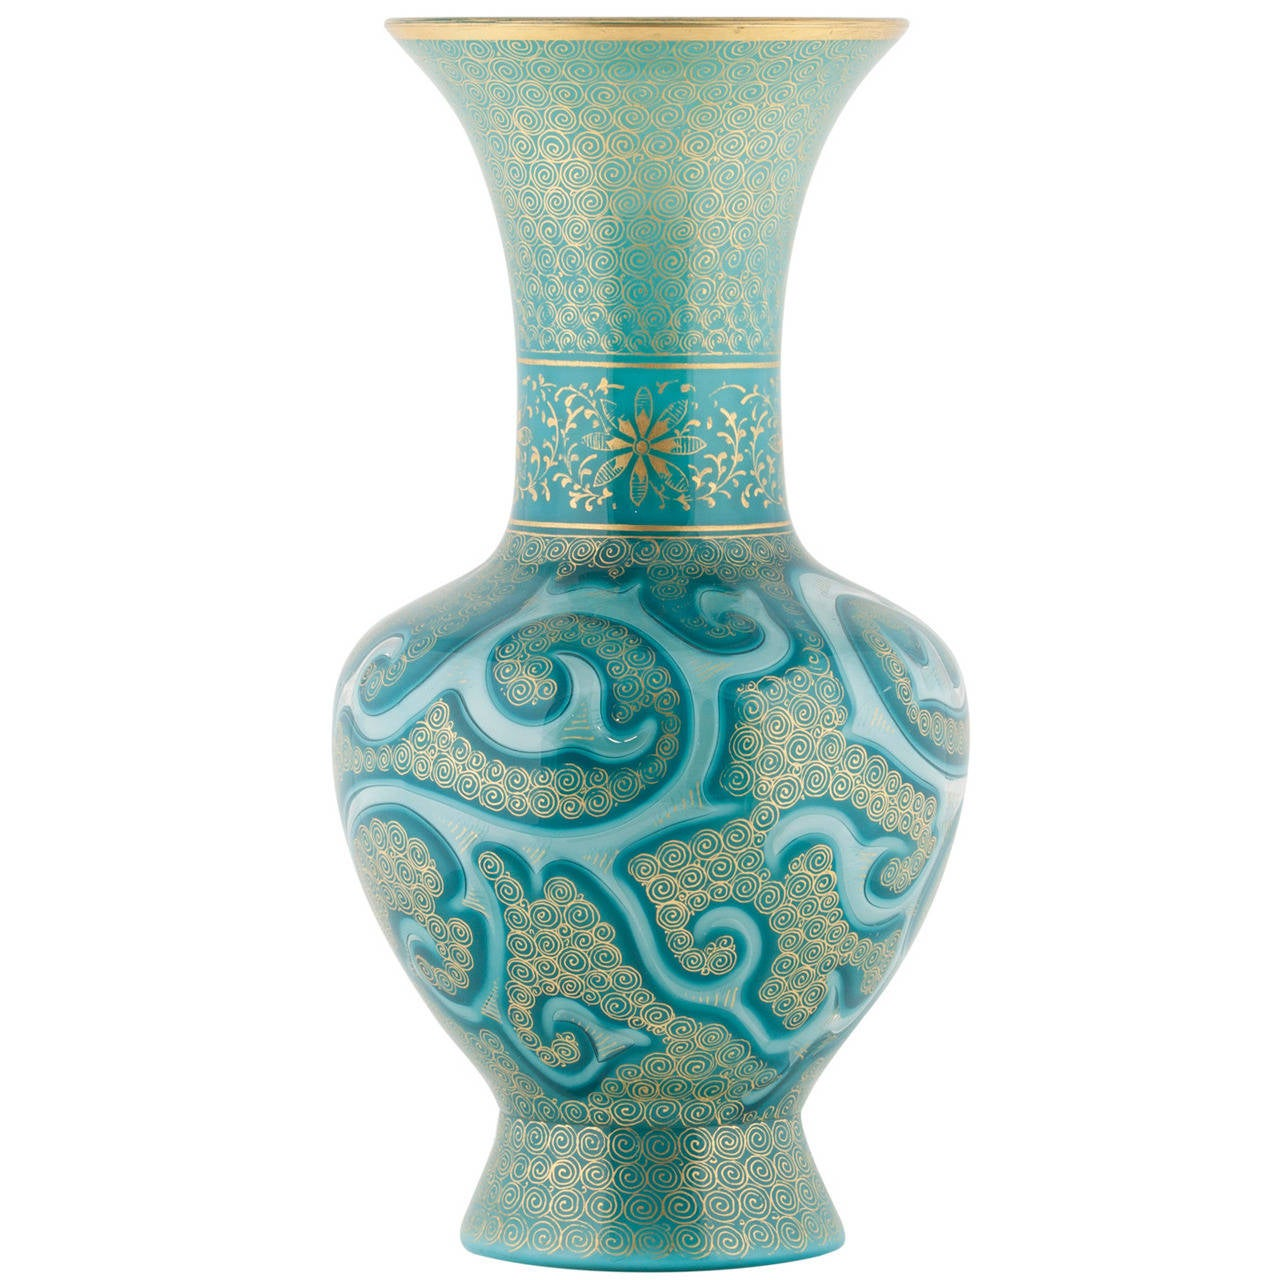 Loetz octopus vase circa 1888 at 1stdibs loetz octopus vase circa 1888 for sale reviewsmspy